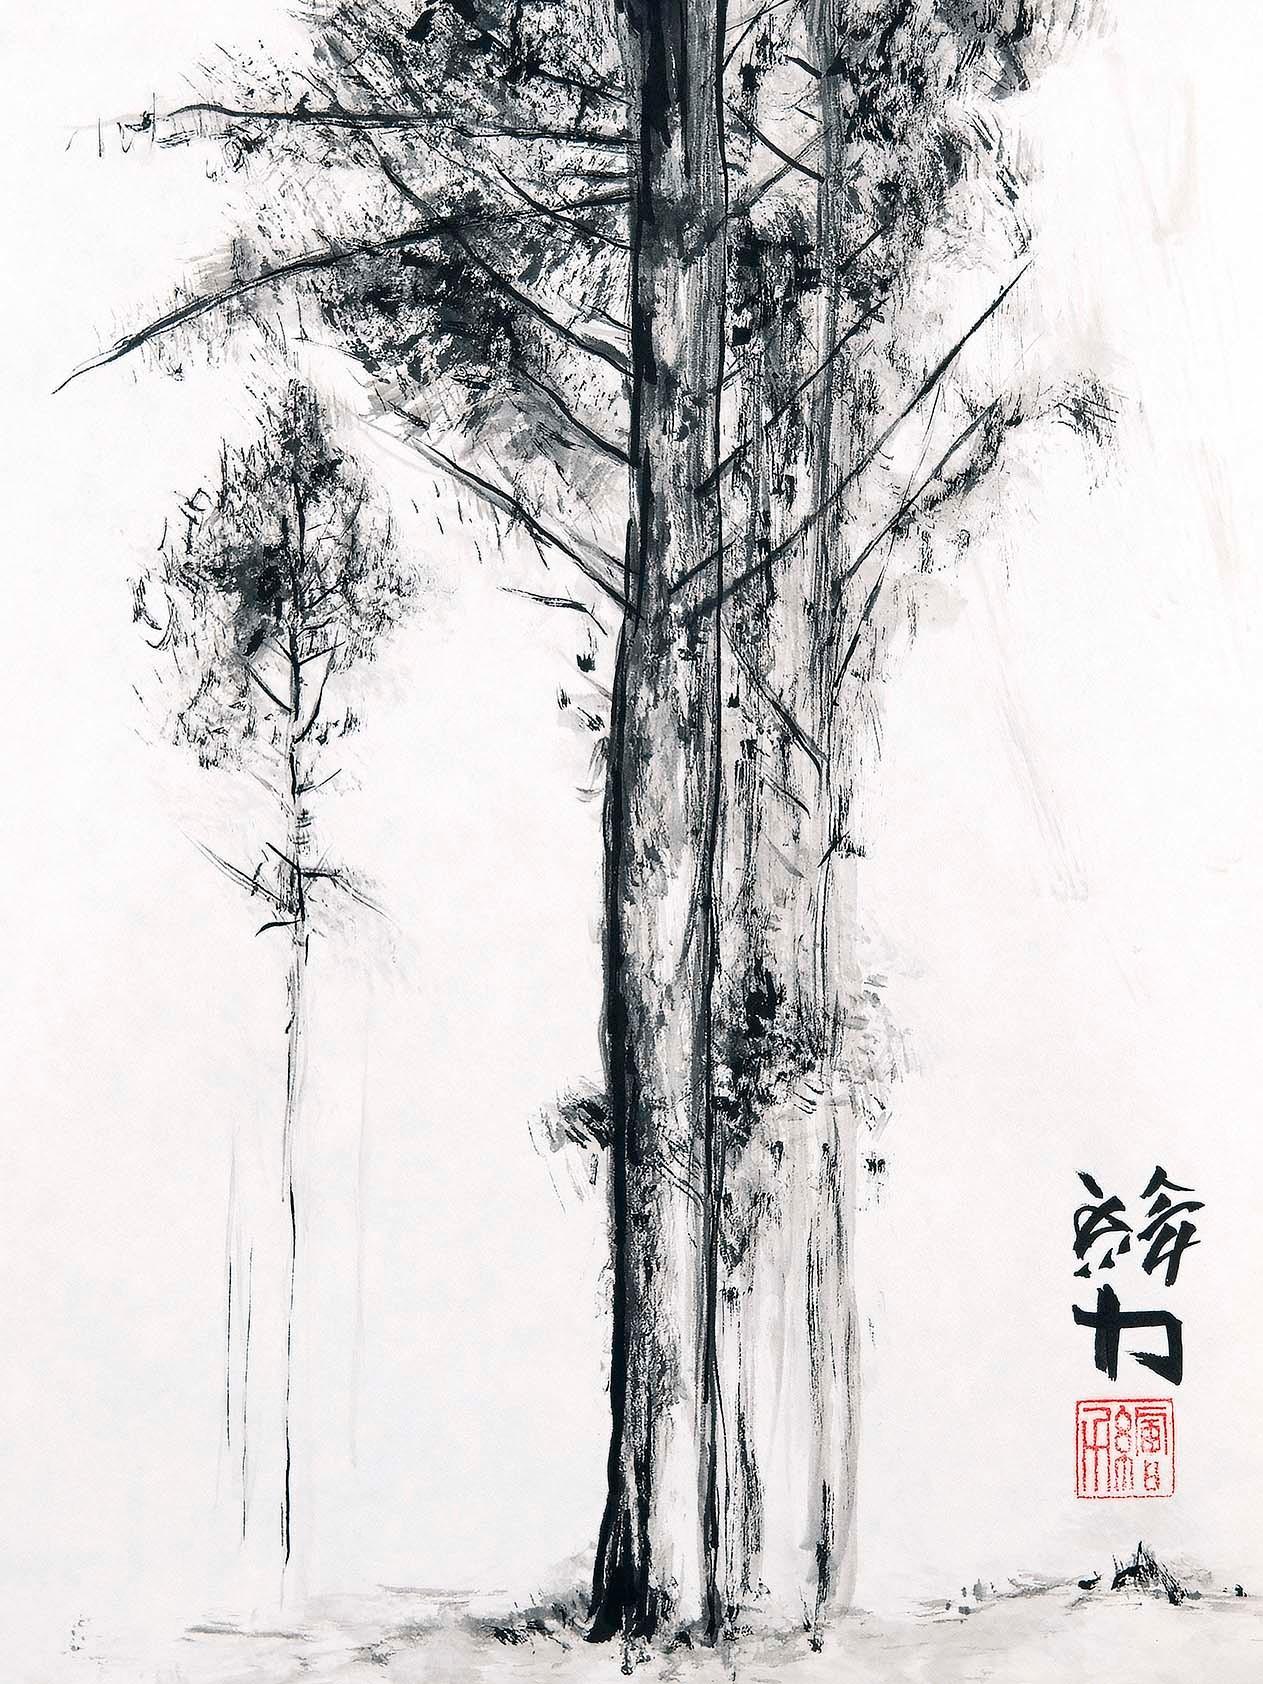 Hombretheartist sumie pinetree 5 forwebsite iskbp2